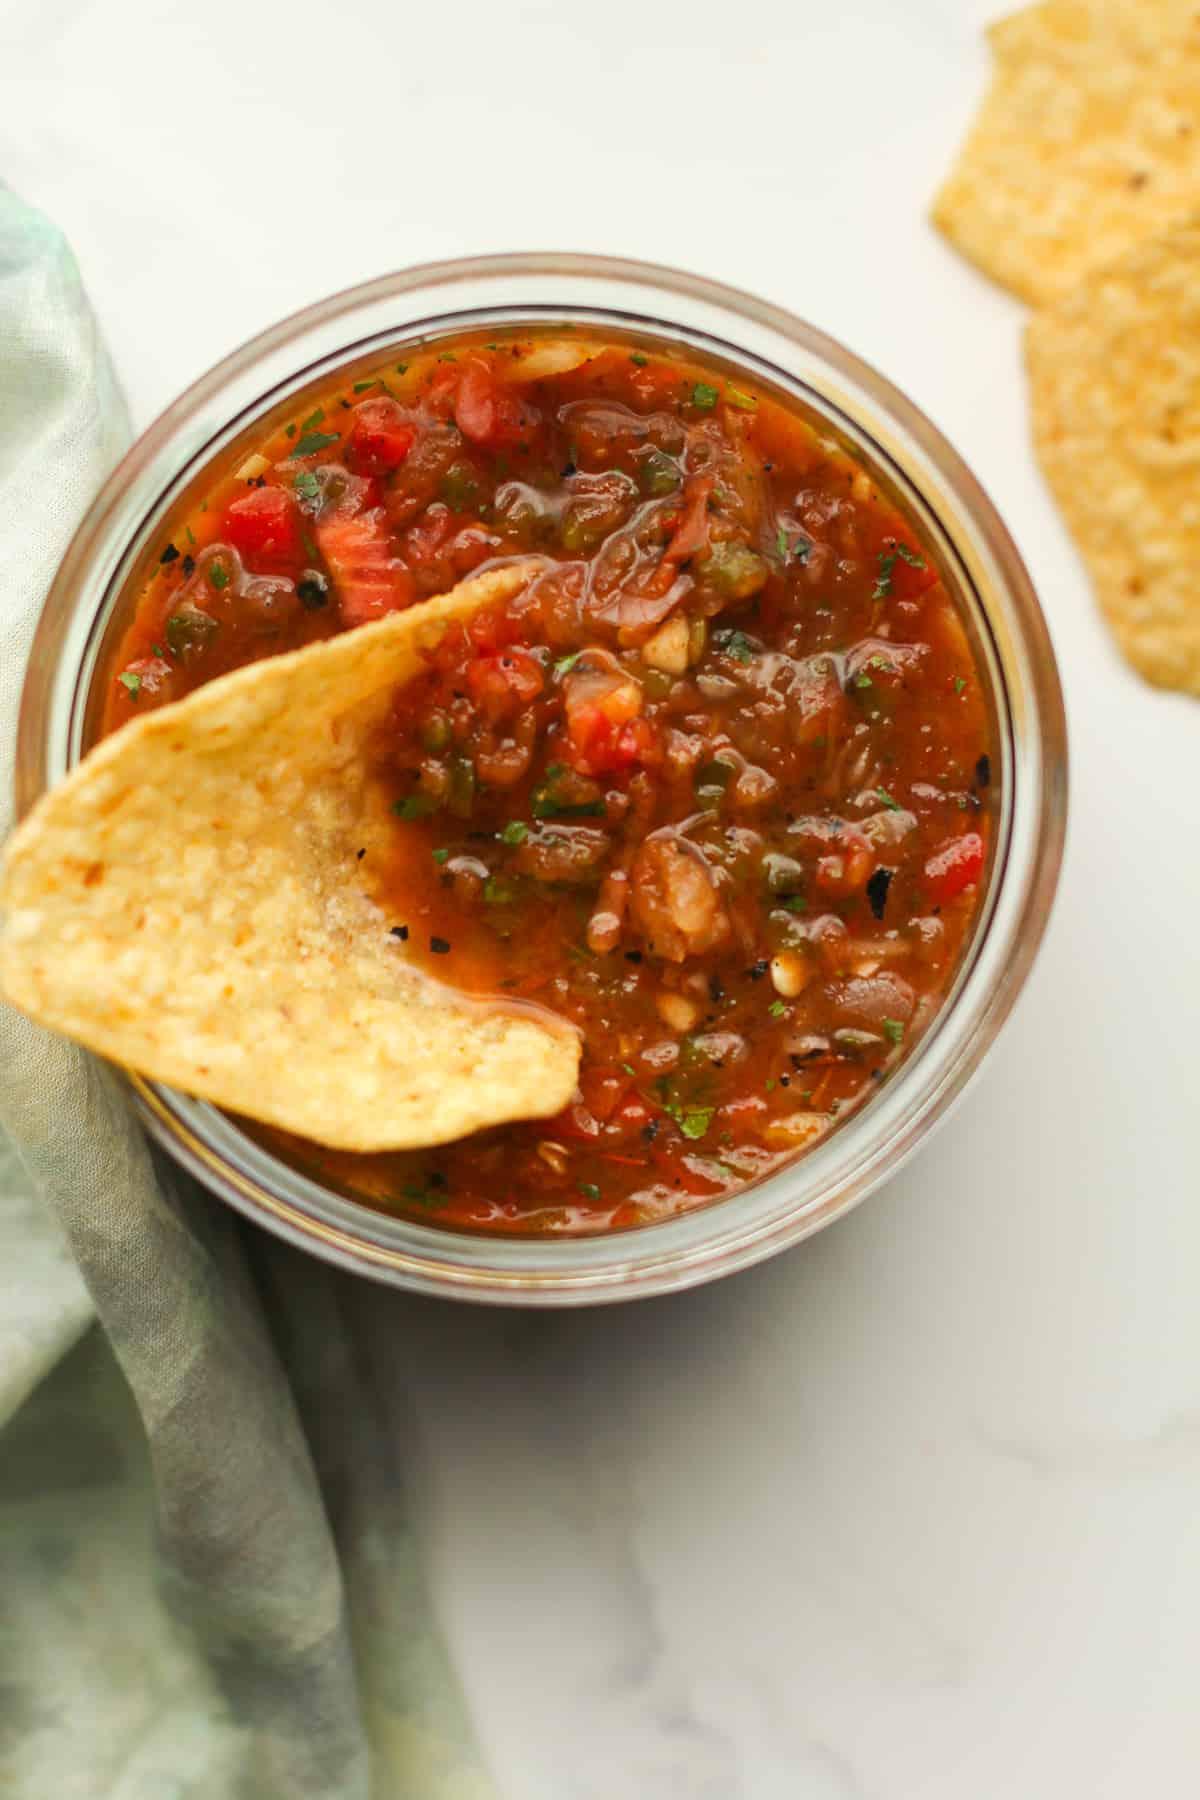 A jar of homemade salsa with a chip inside.